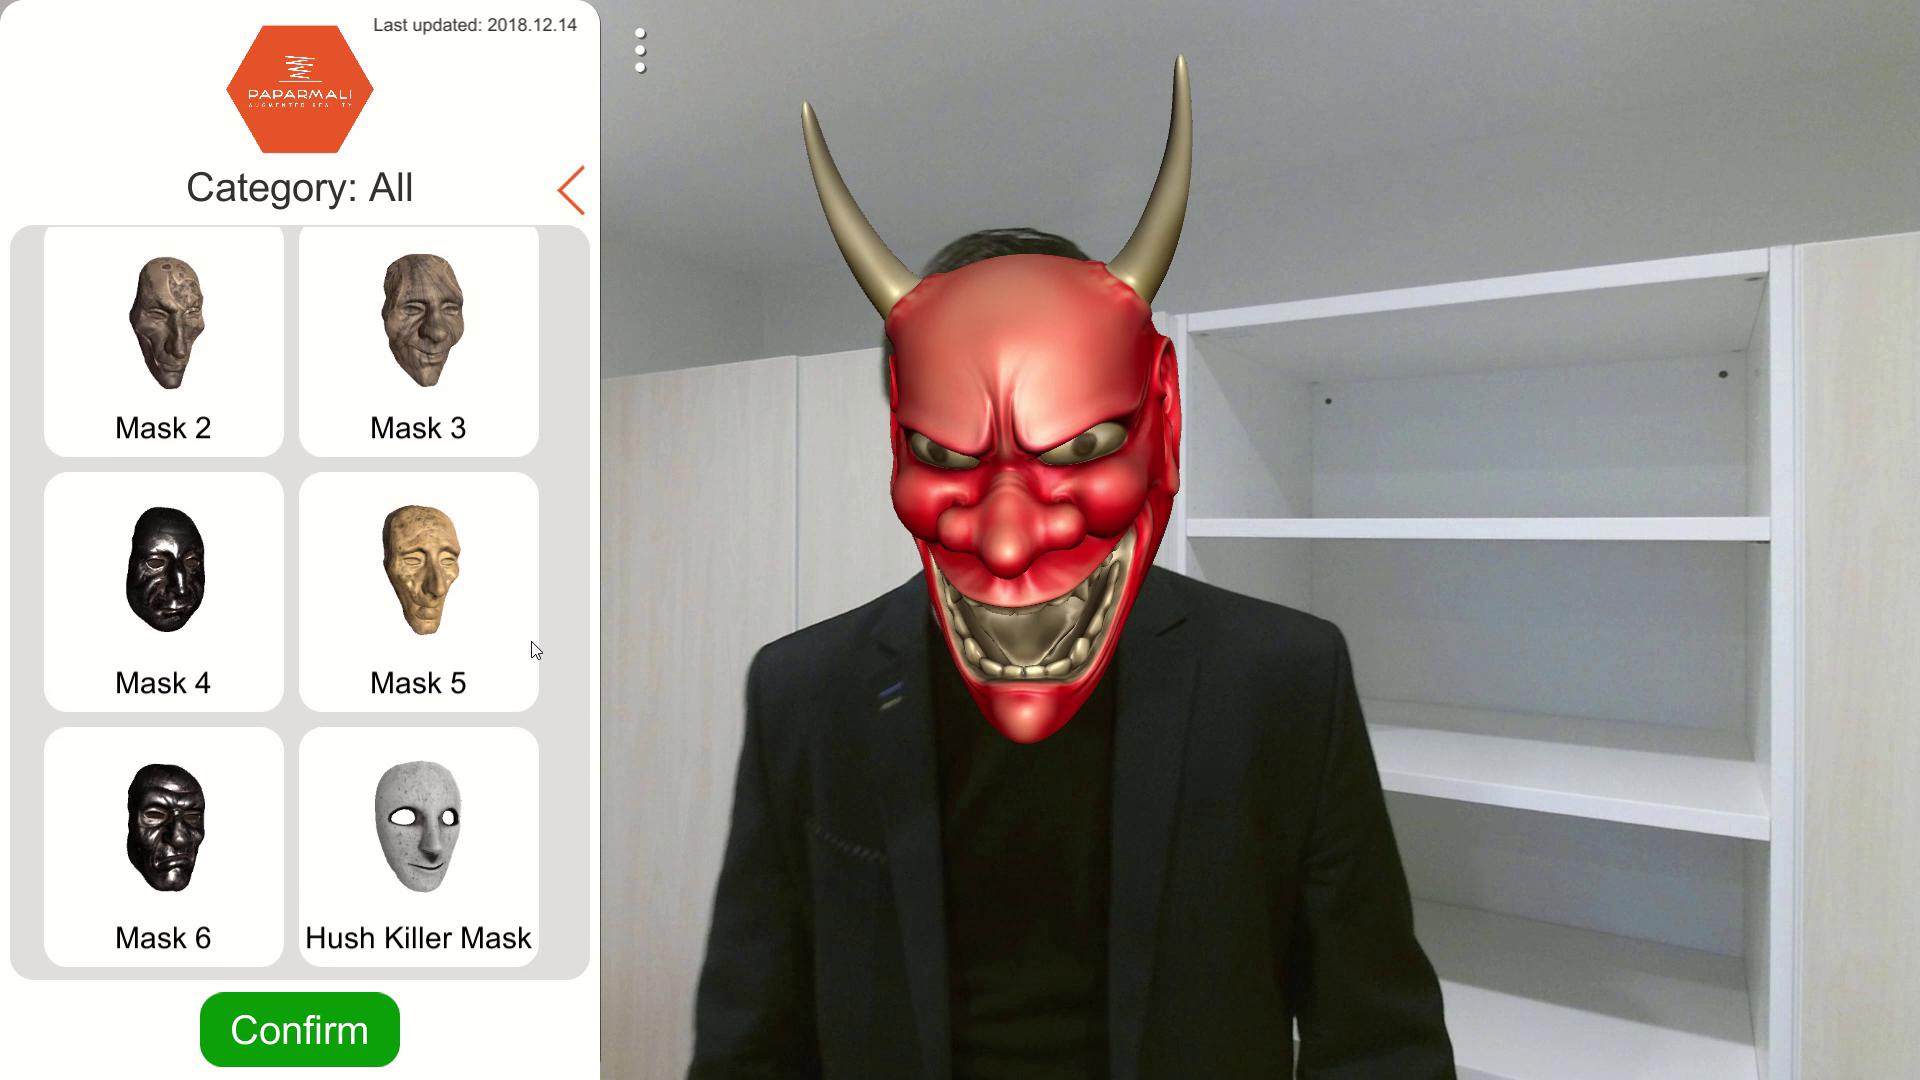 Paparmali 2 - AR Face Tracking using Kinect 2